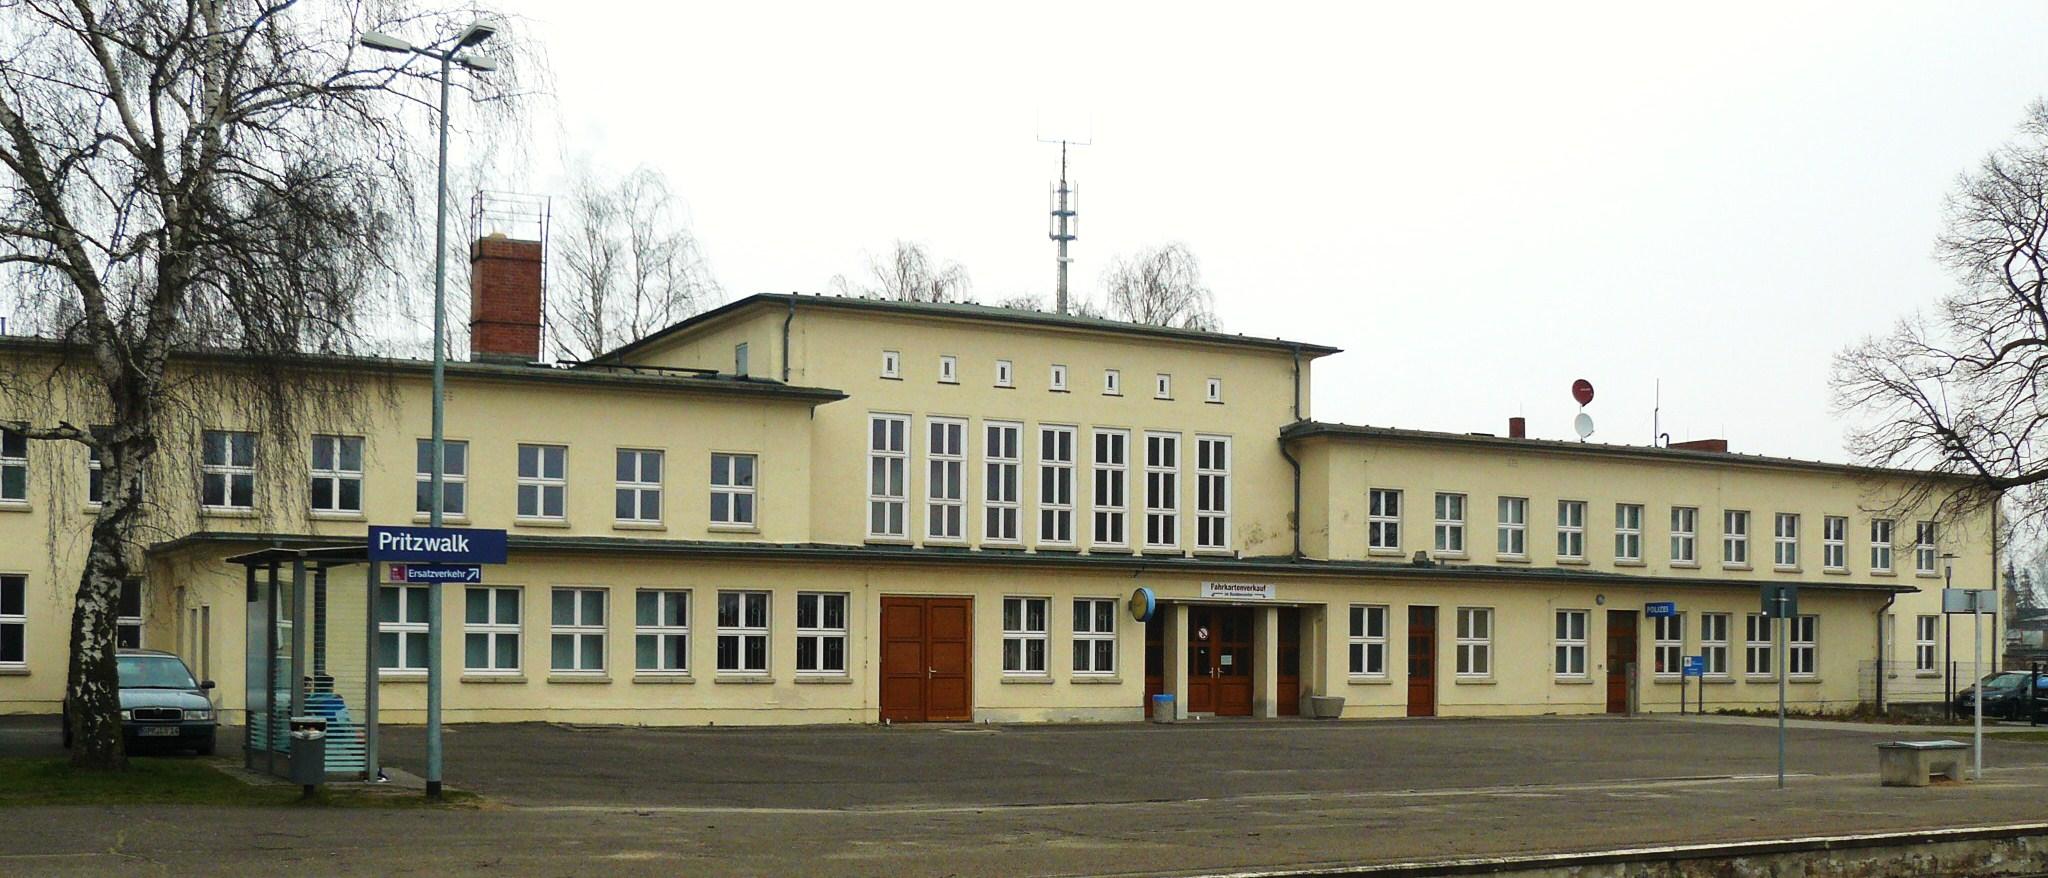 pritzwalk bahnhof